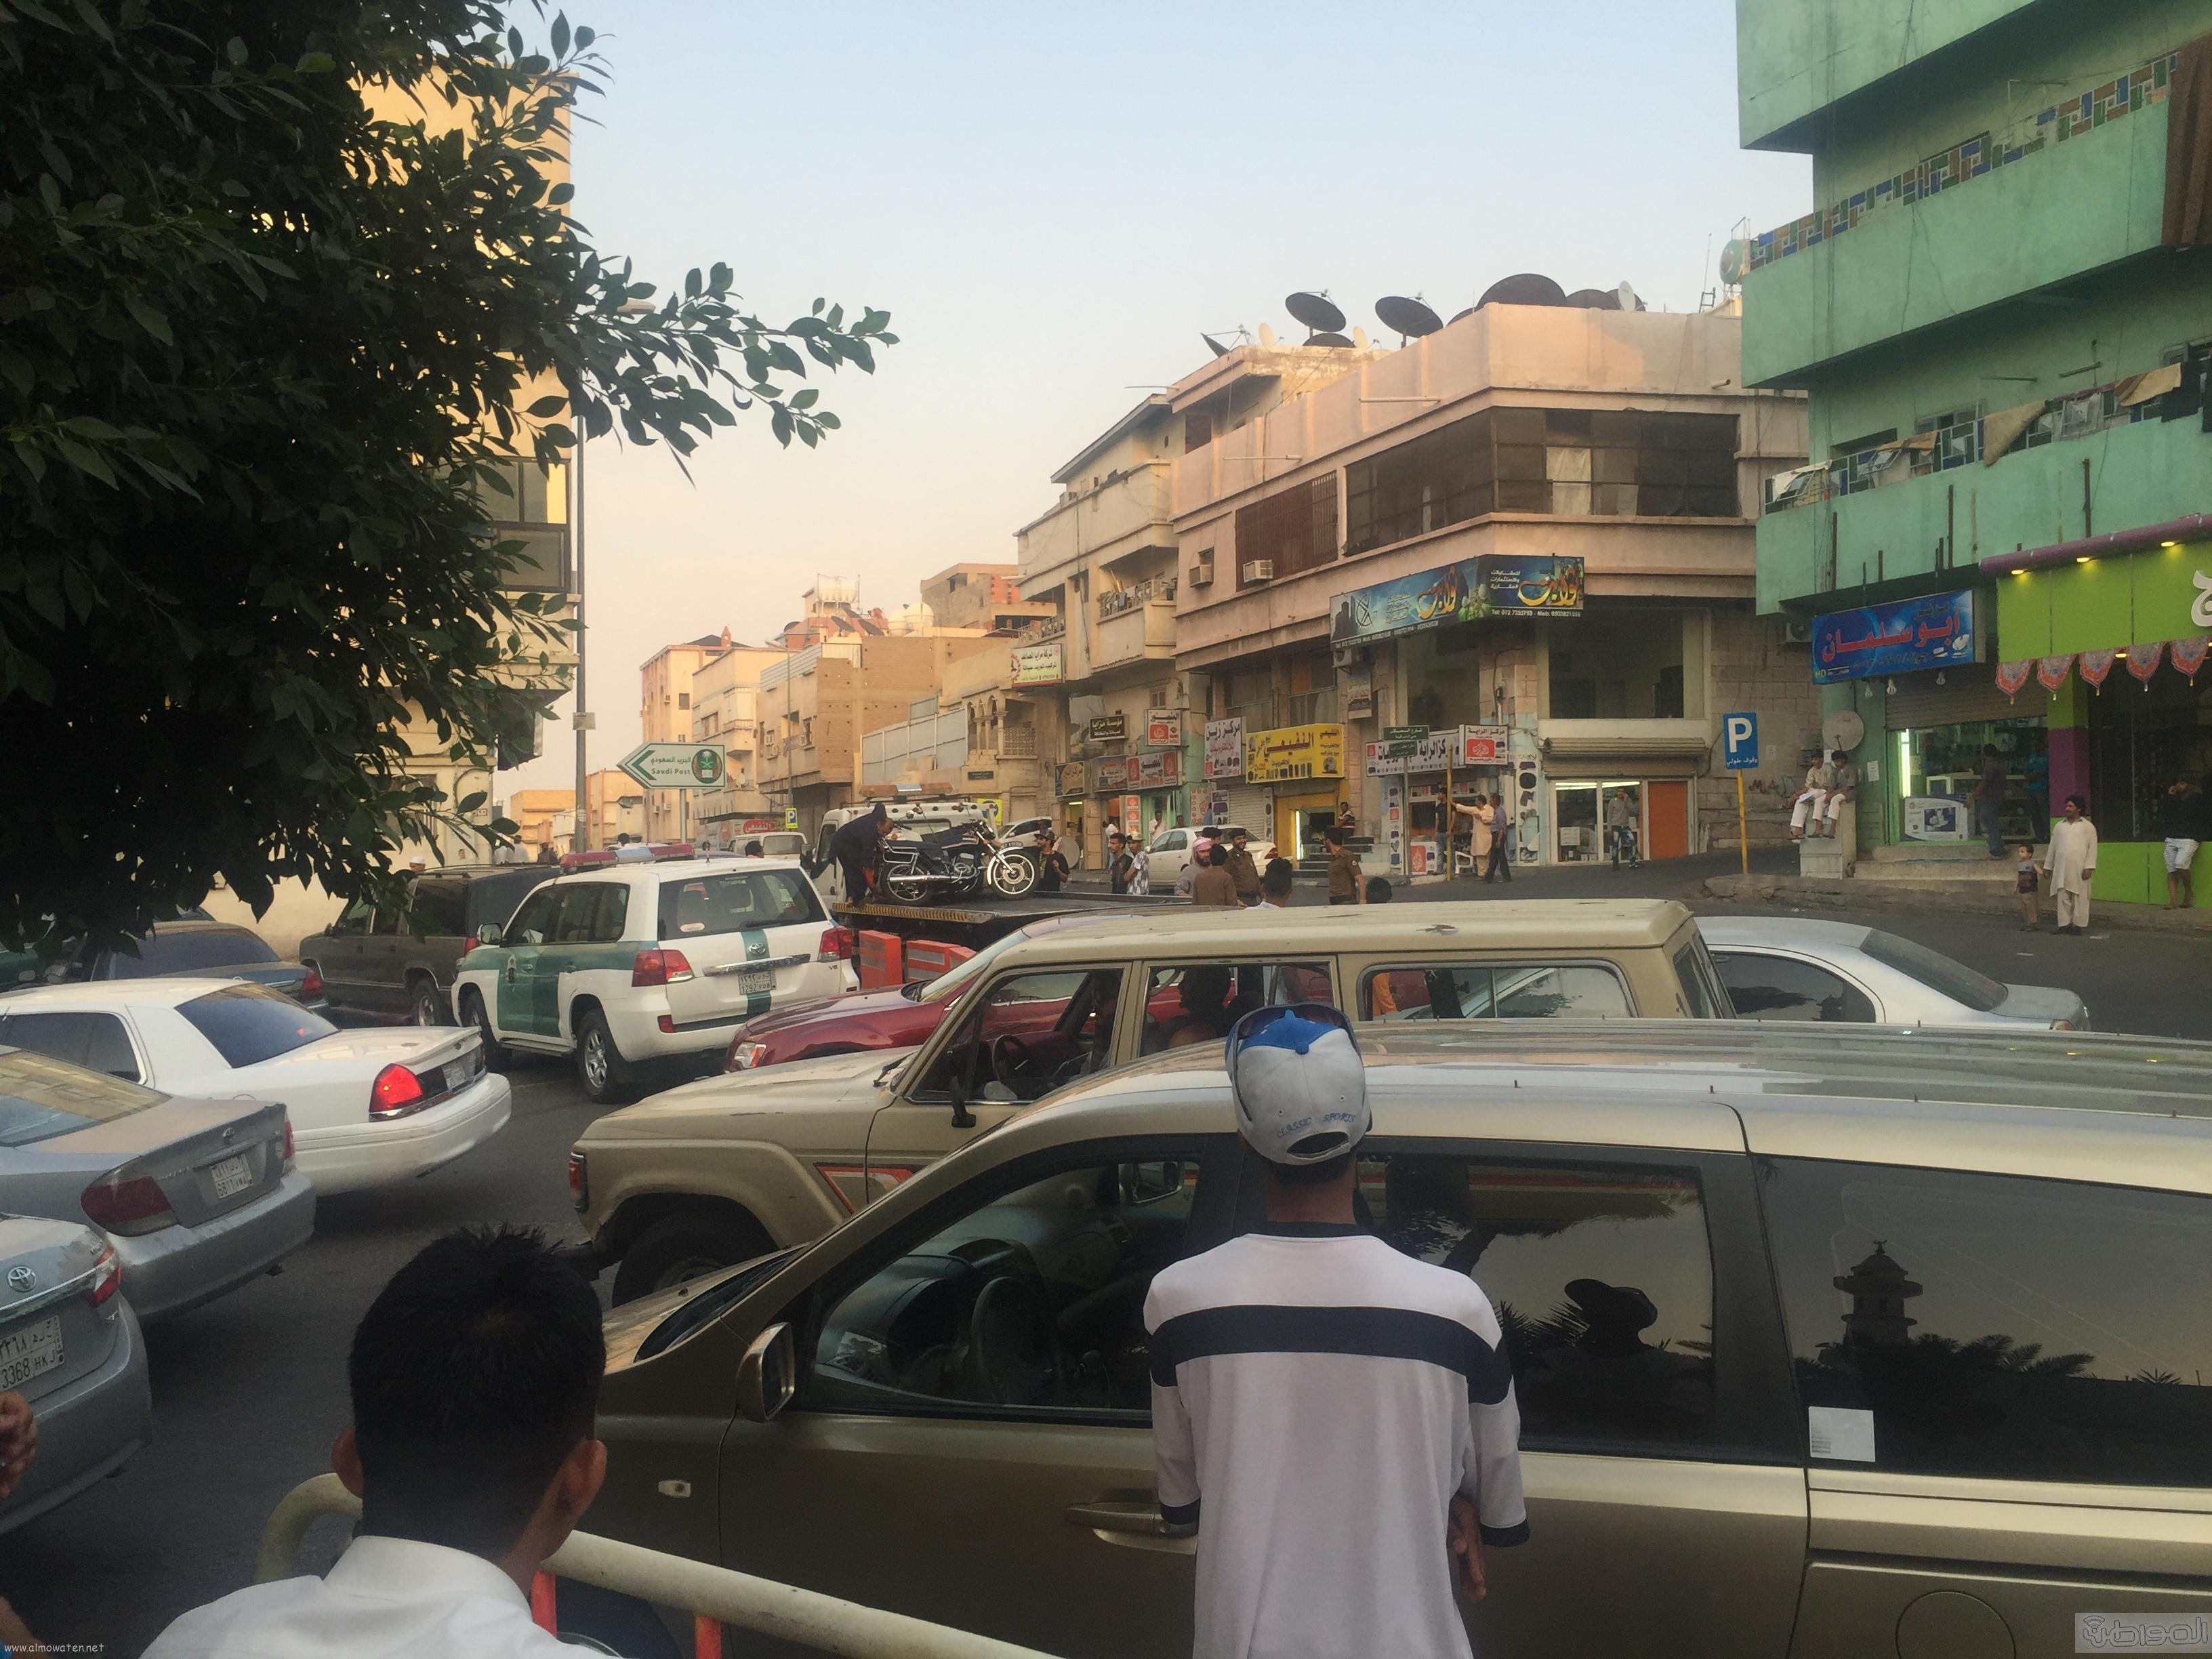 شارع عكاظ بالطائف زوار رمضان (3)